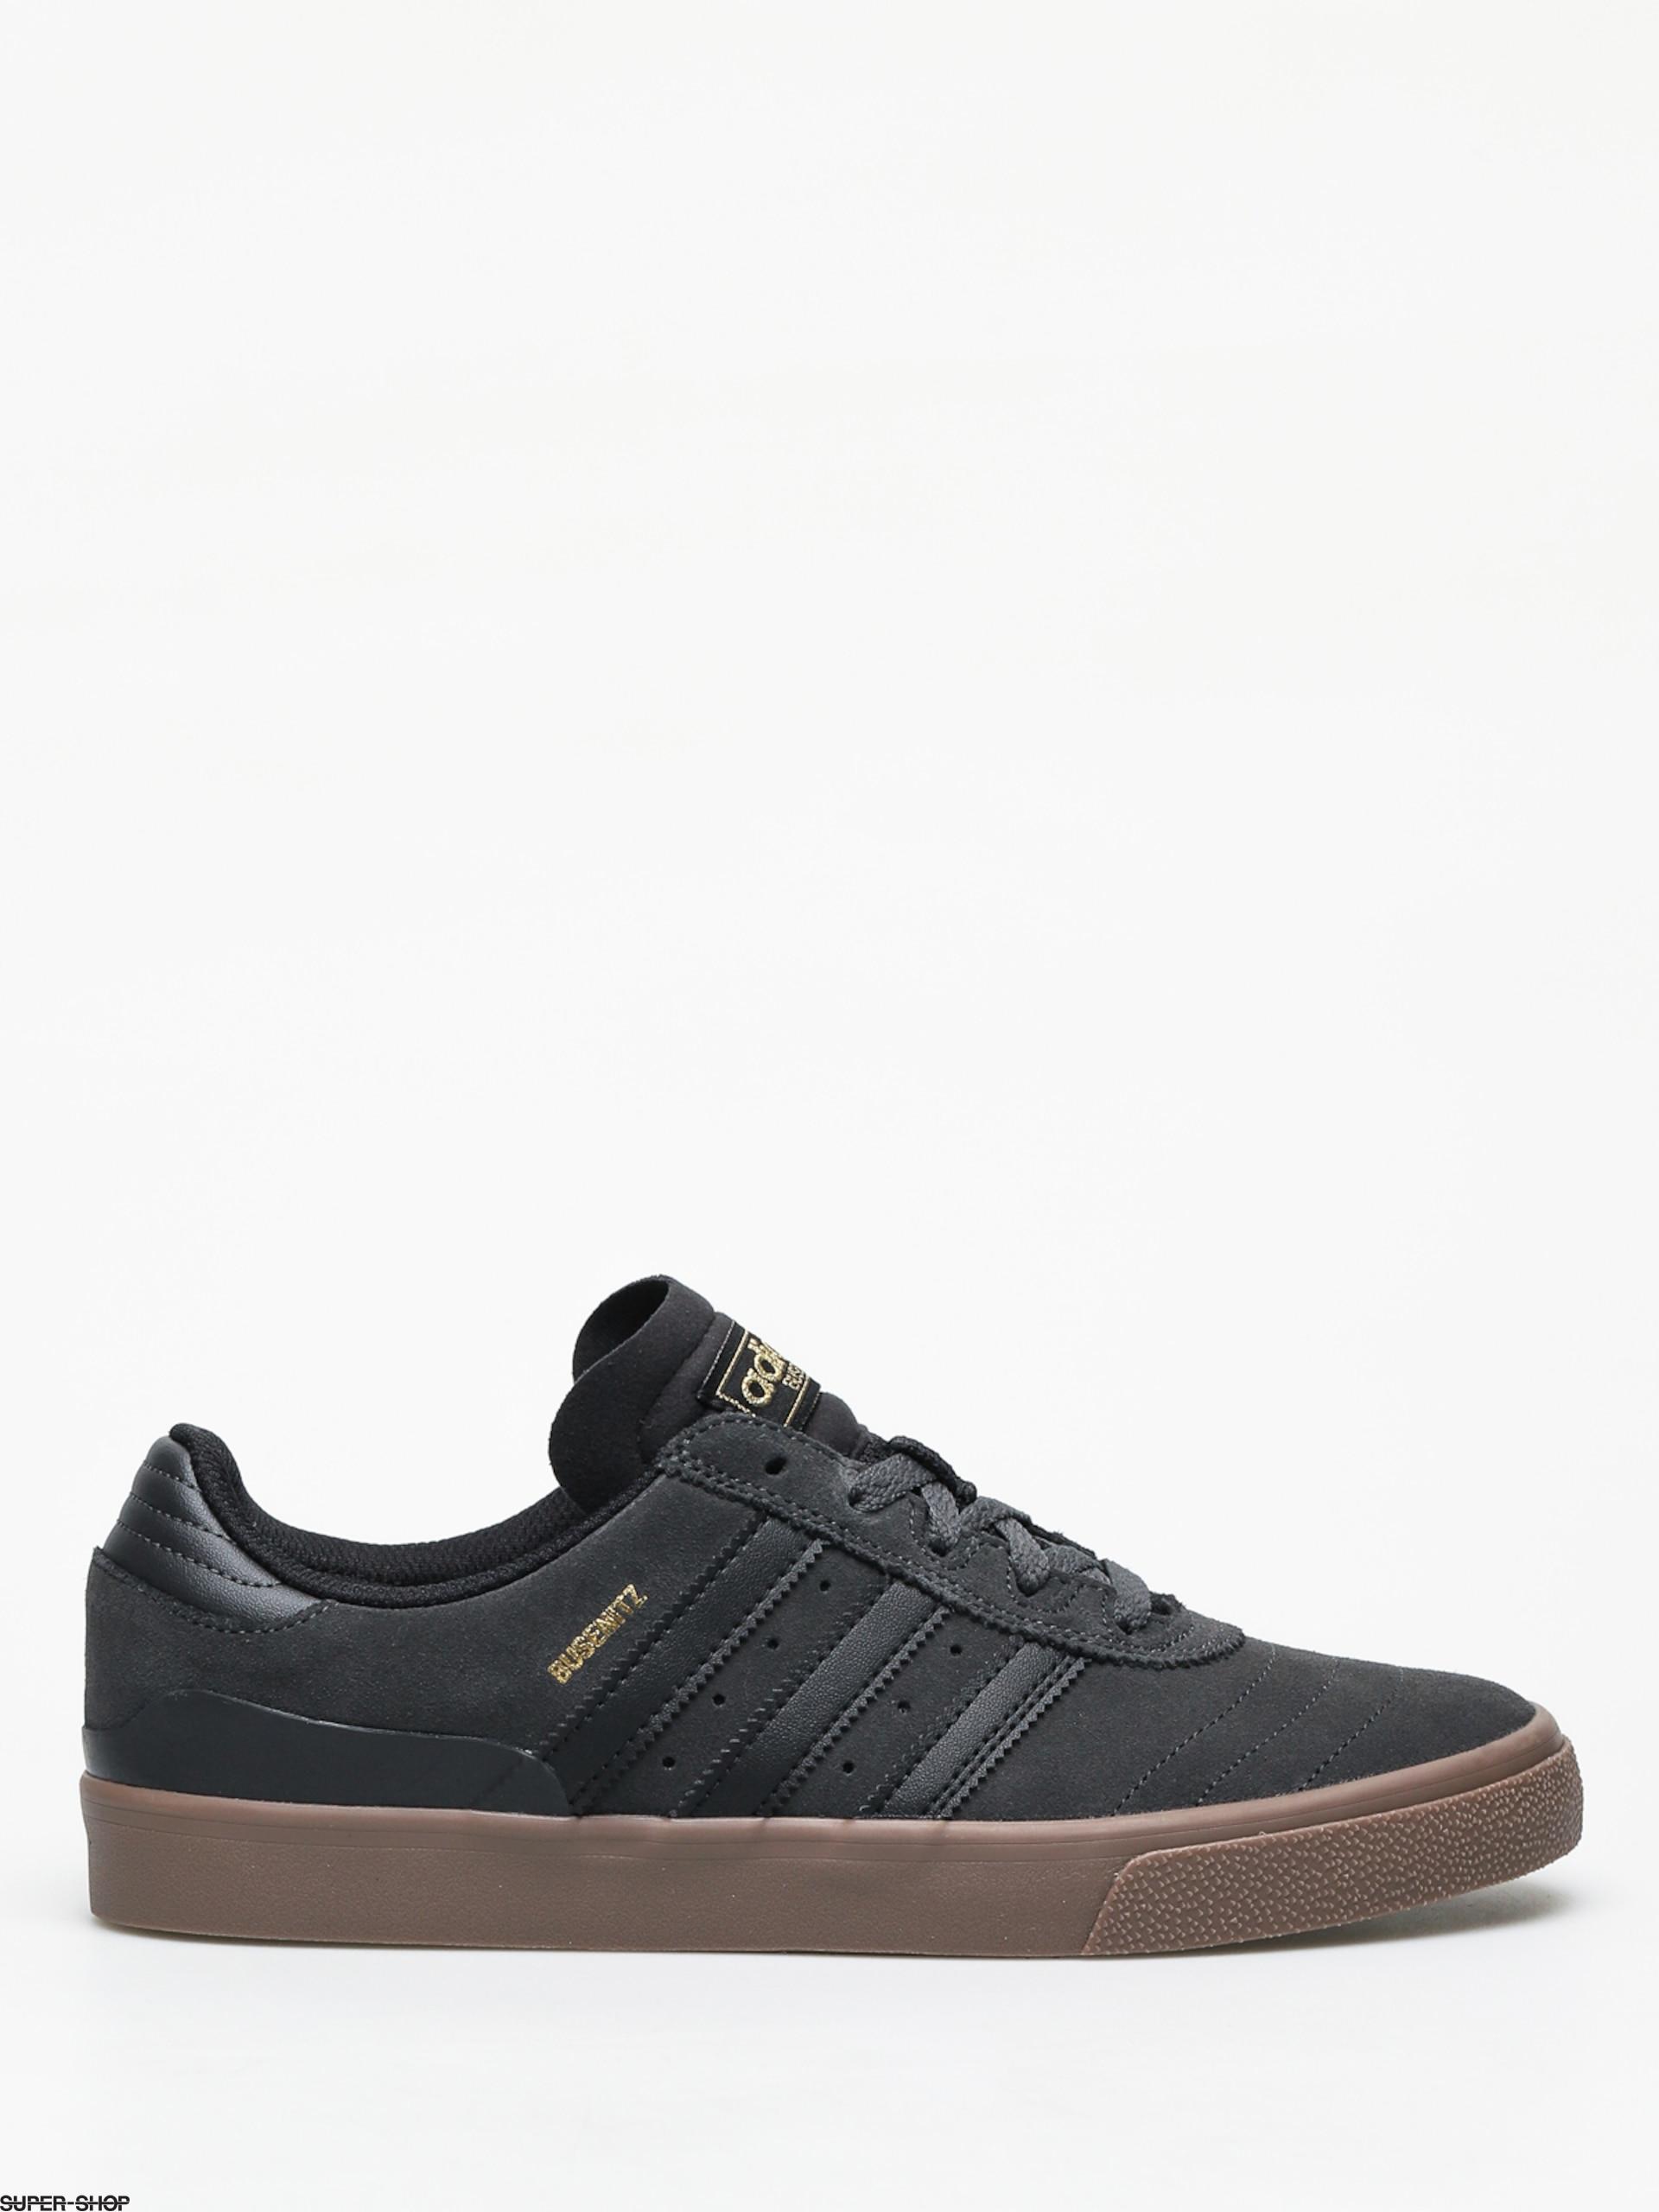 new style 34aa3 898c6 1012881-w1920-adidas-busenitz-vulc-shoes-dgsogr-cblack-gum5.jpg